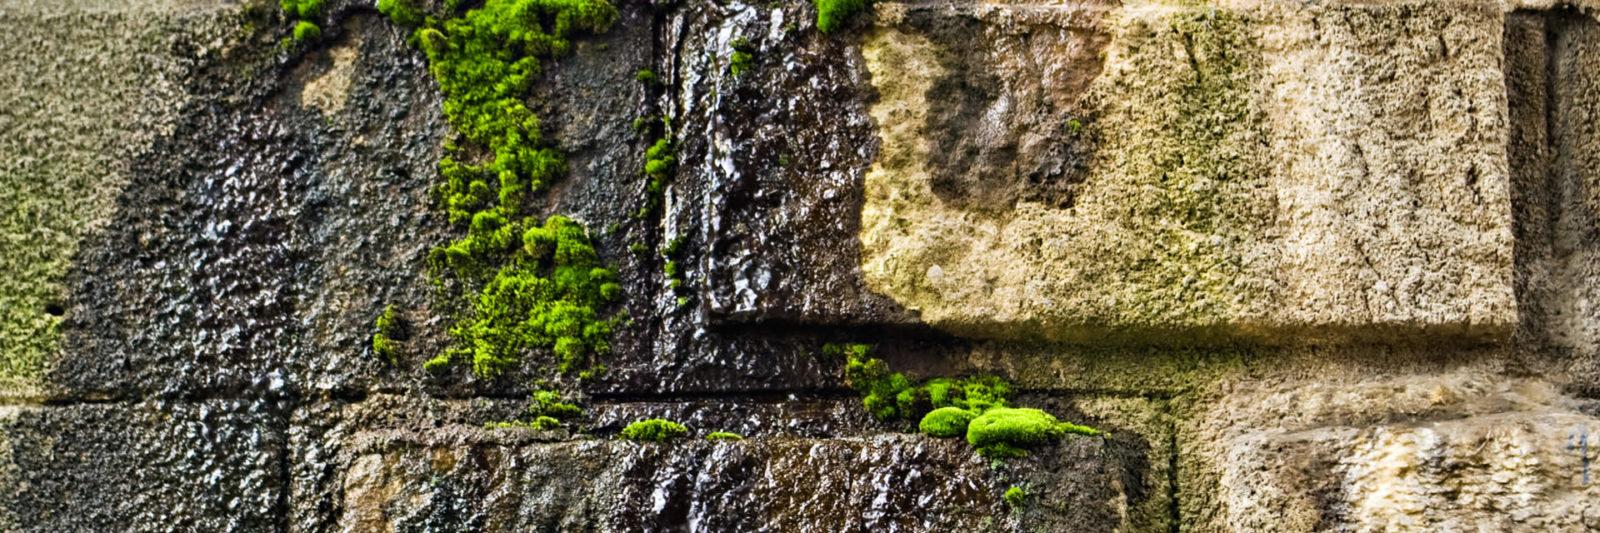 algaangroei muur